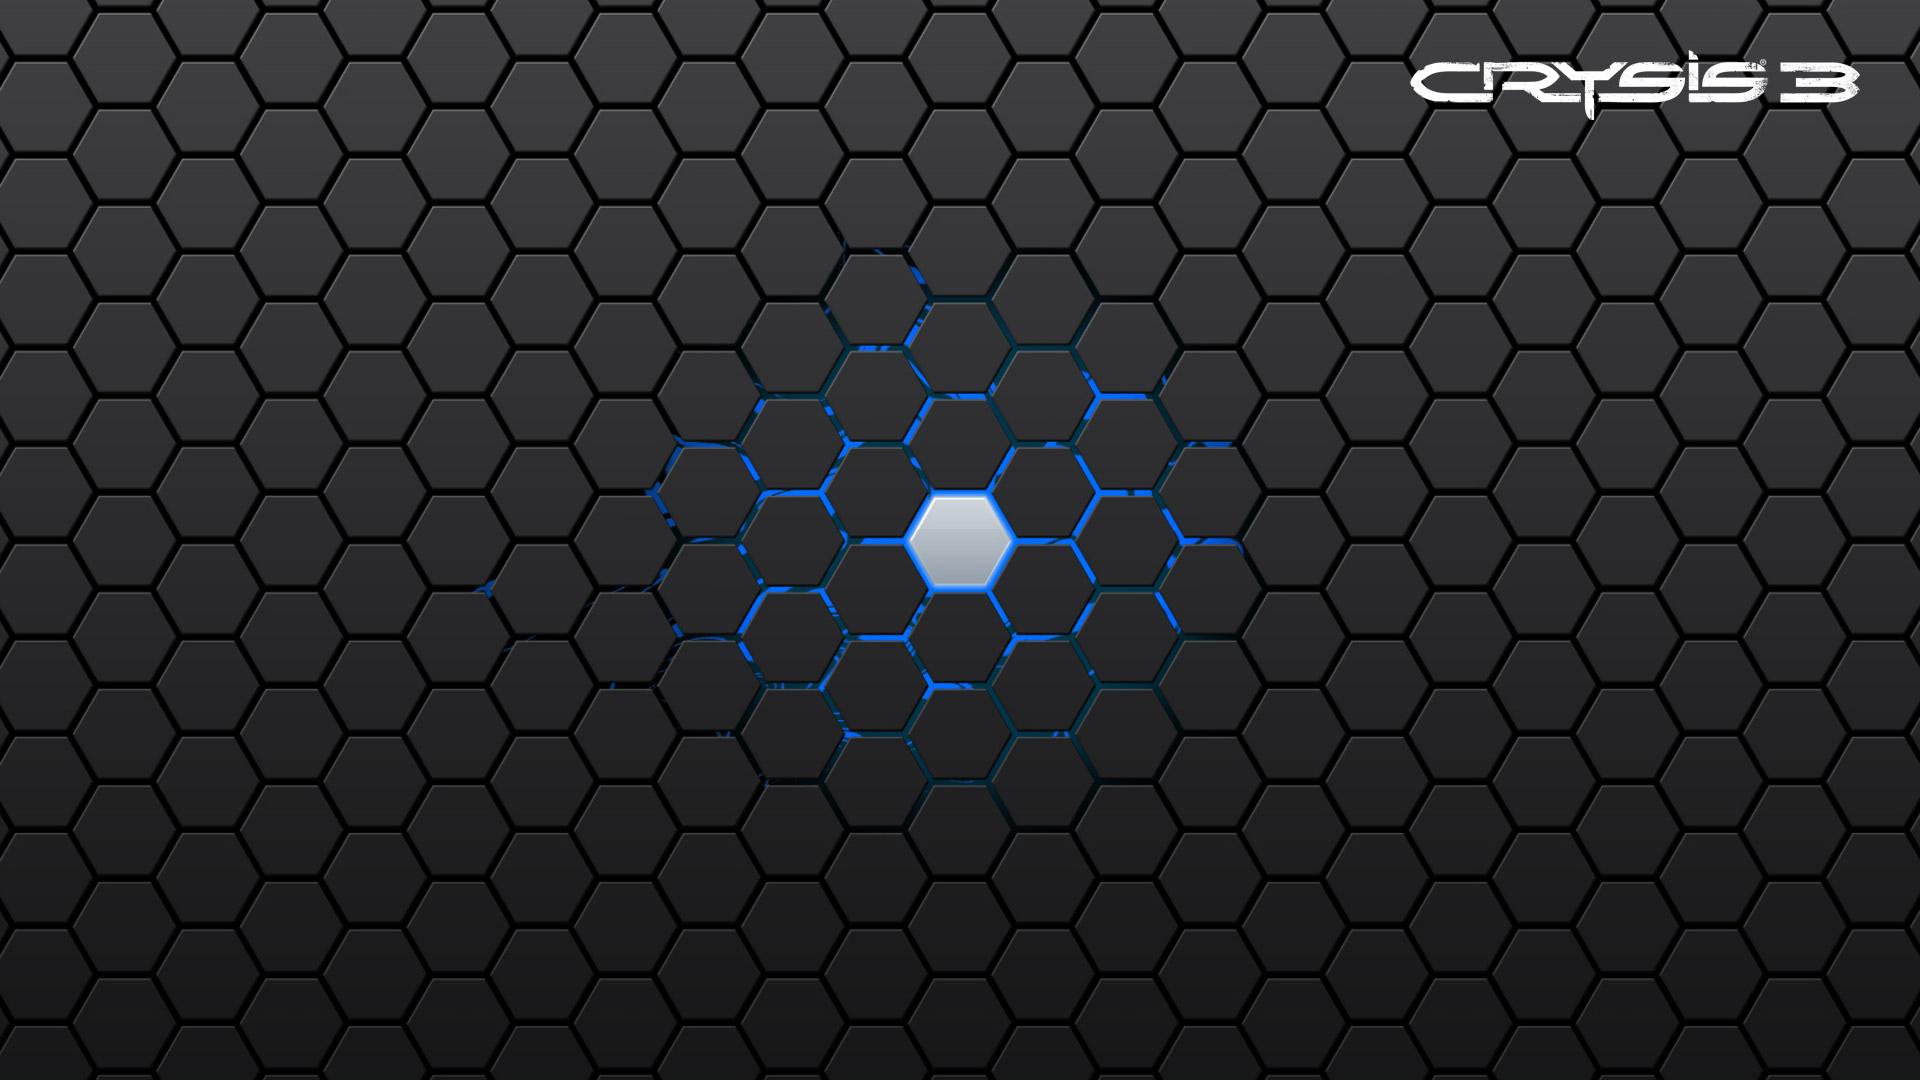 Free Crysis 3 Wallpaper in 1920x1080